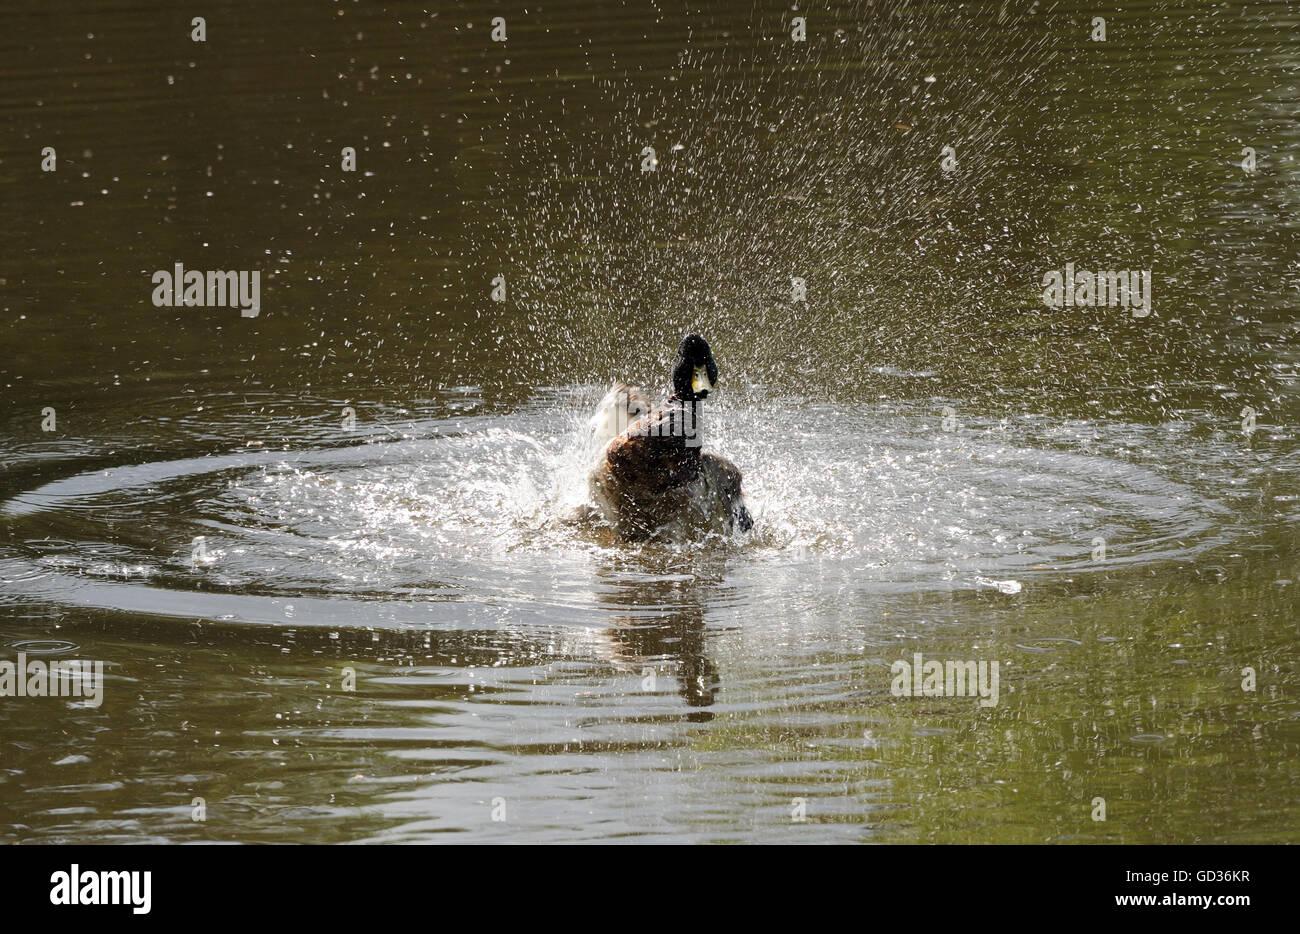 A male mallard (Anas platyrhynchos) duck bathes with great splashing. Lamberhurst, Kent, UK. Stock Photo